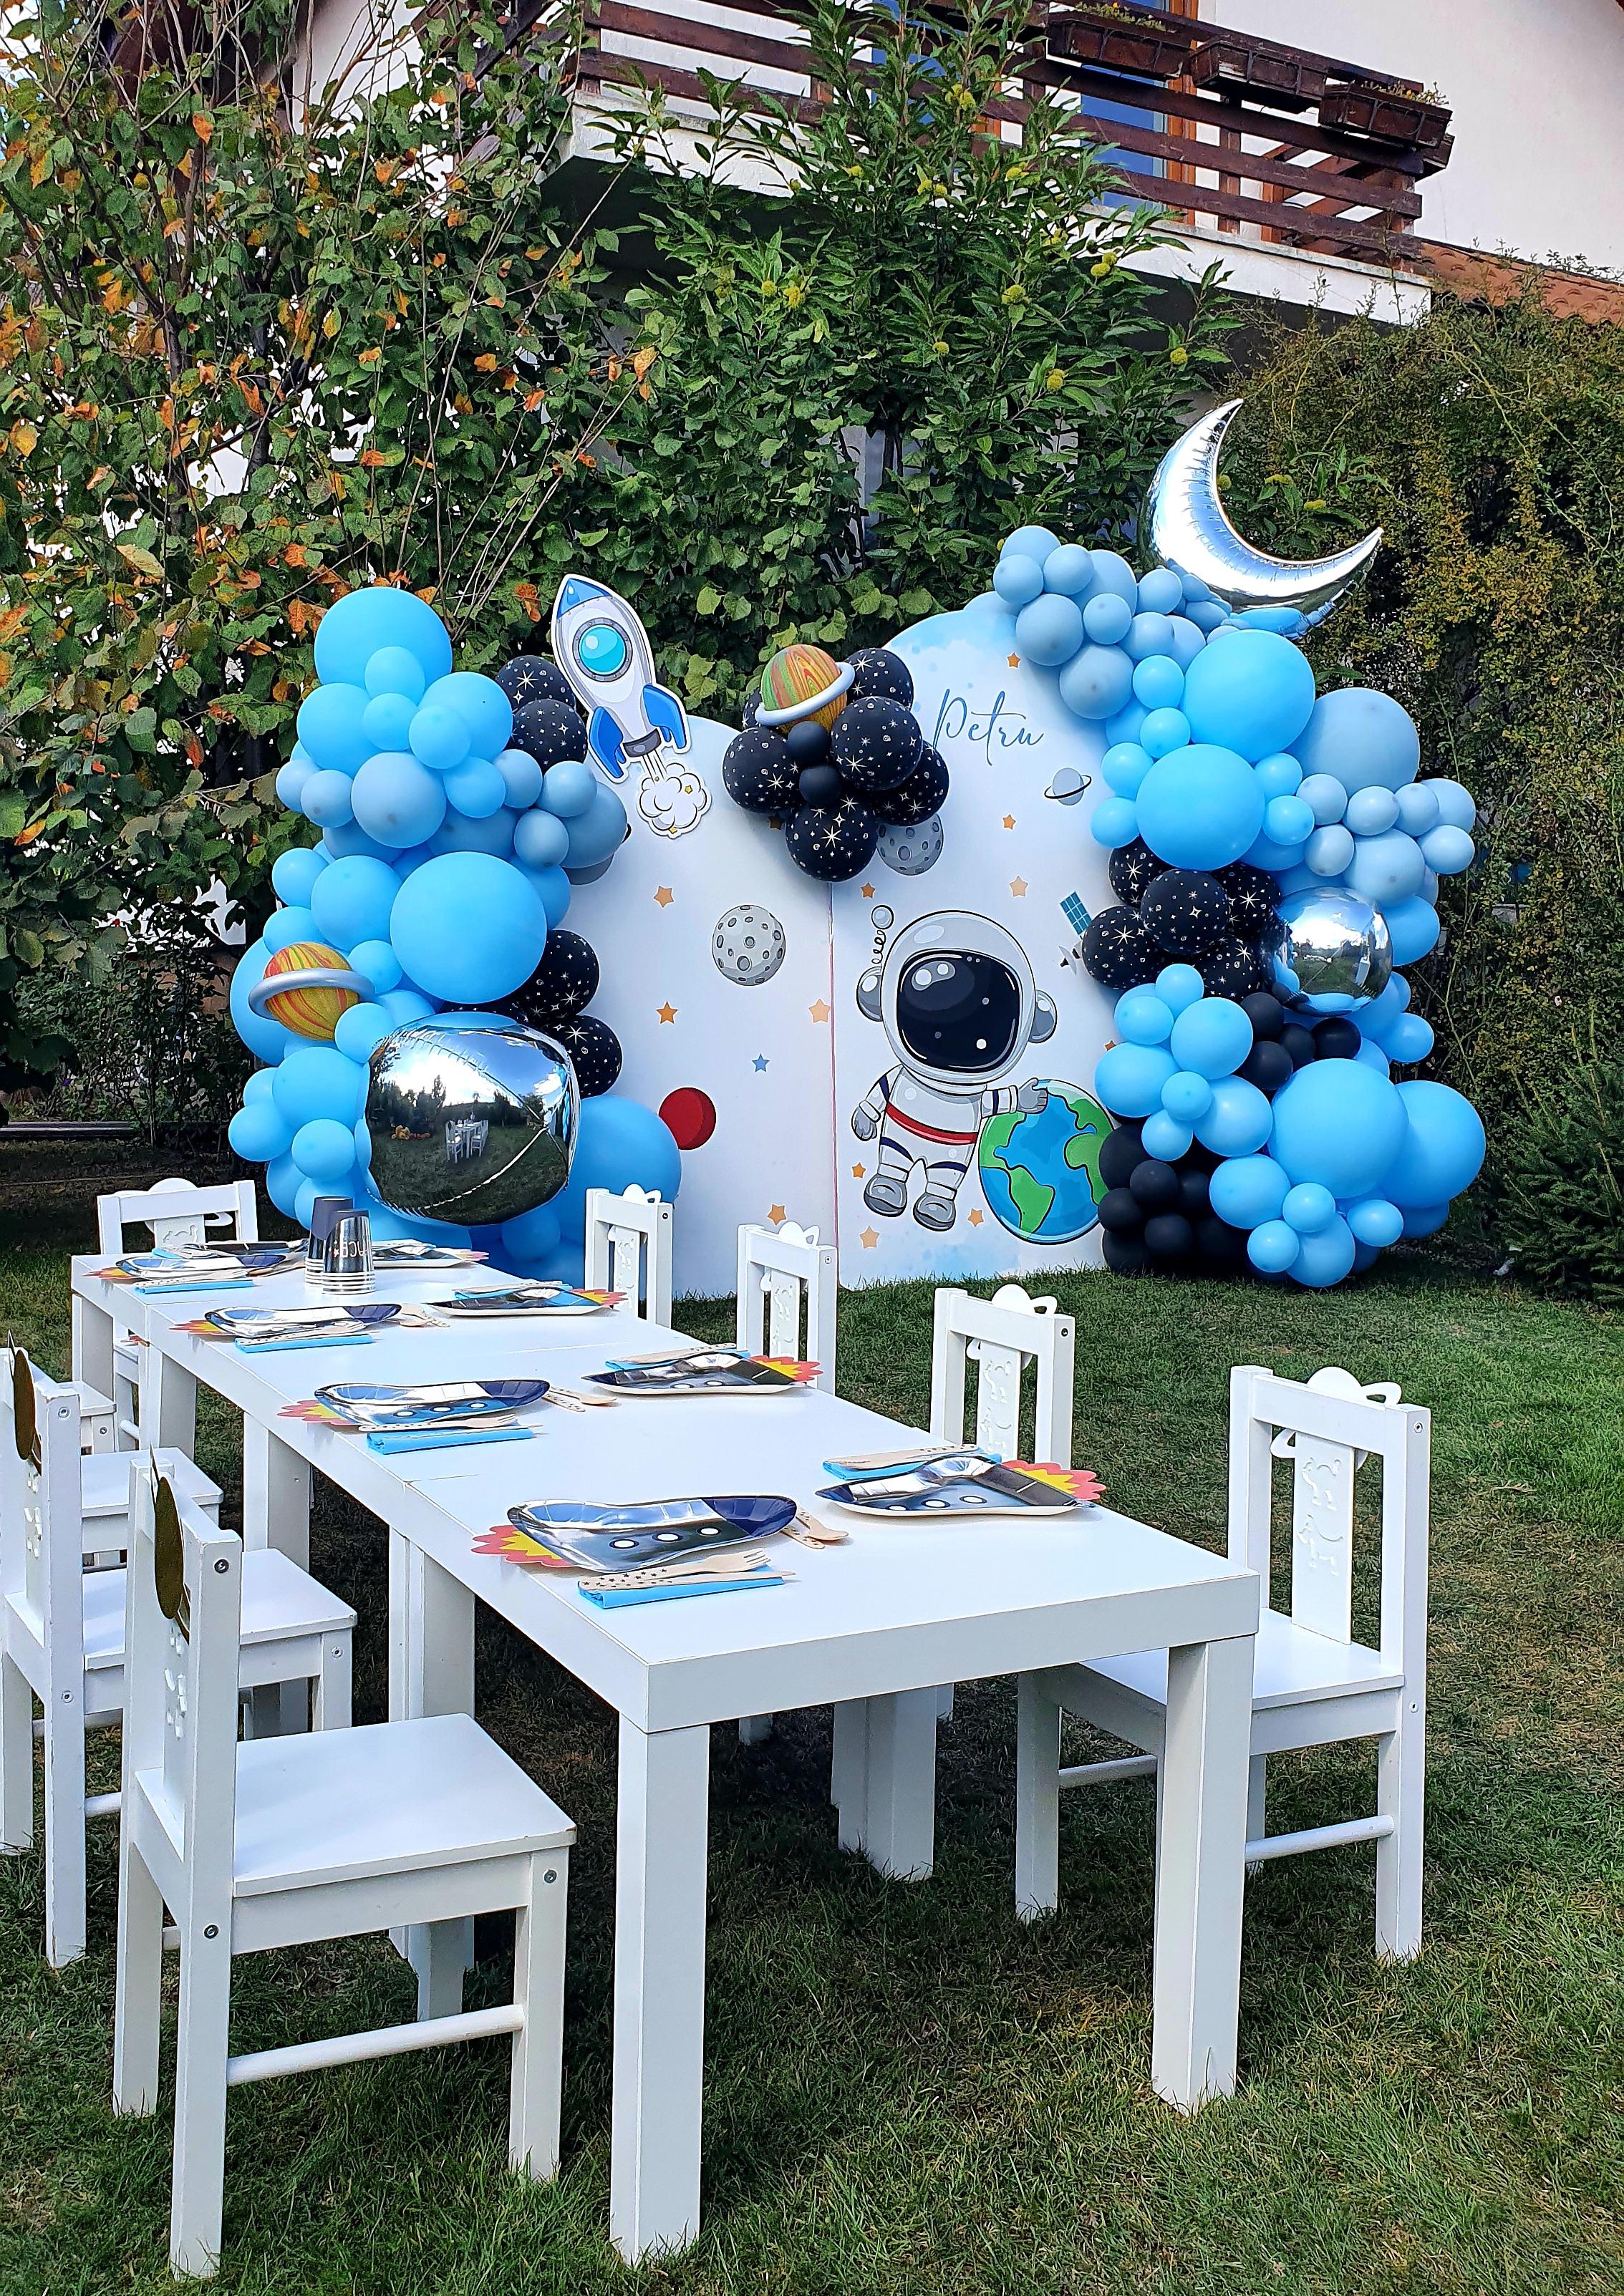 Petru Space Party